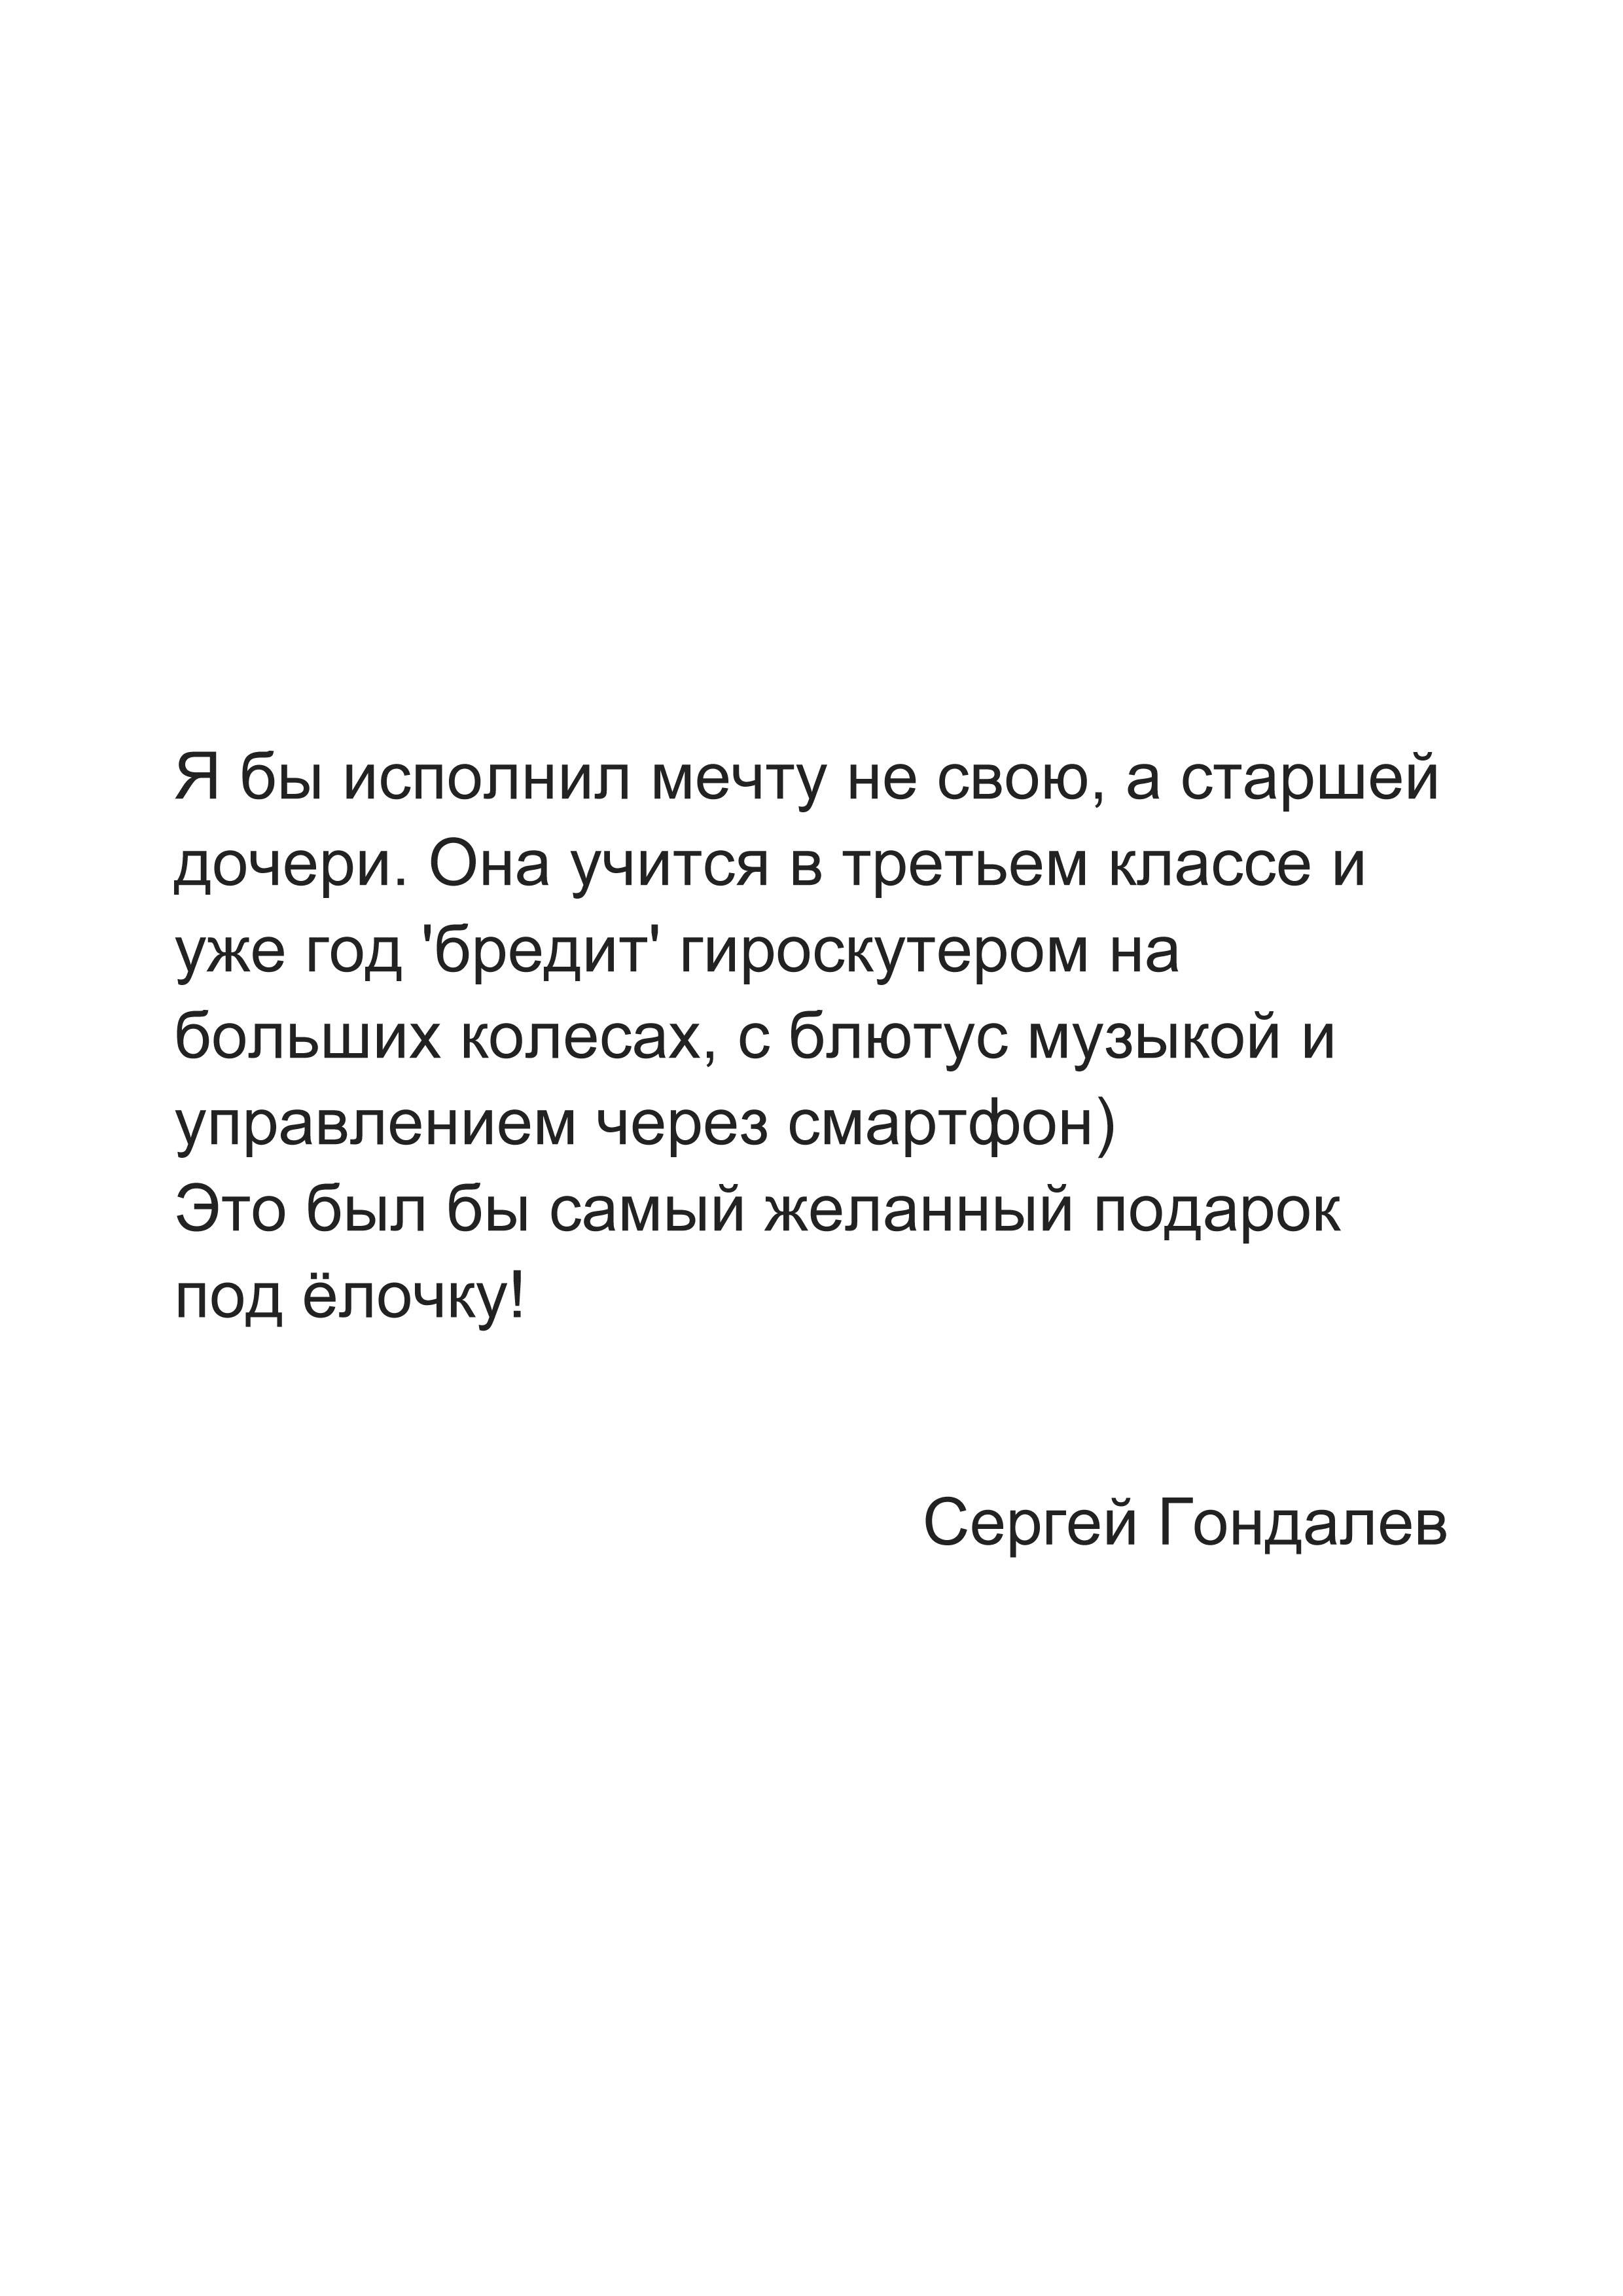 Сергей Гондалев